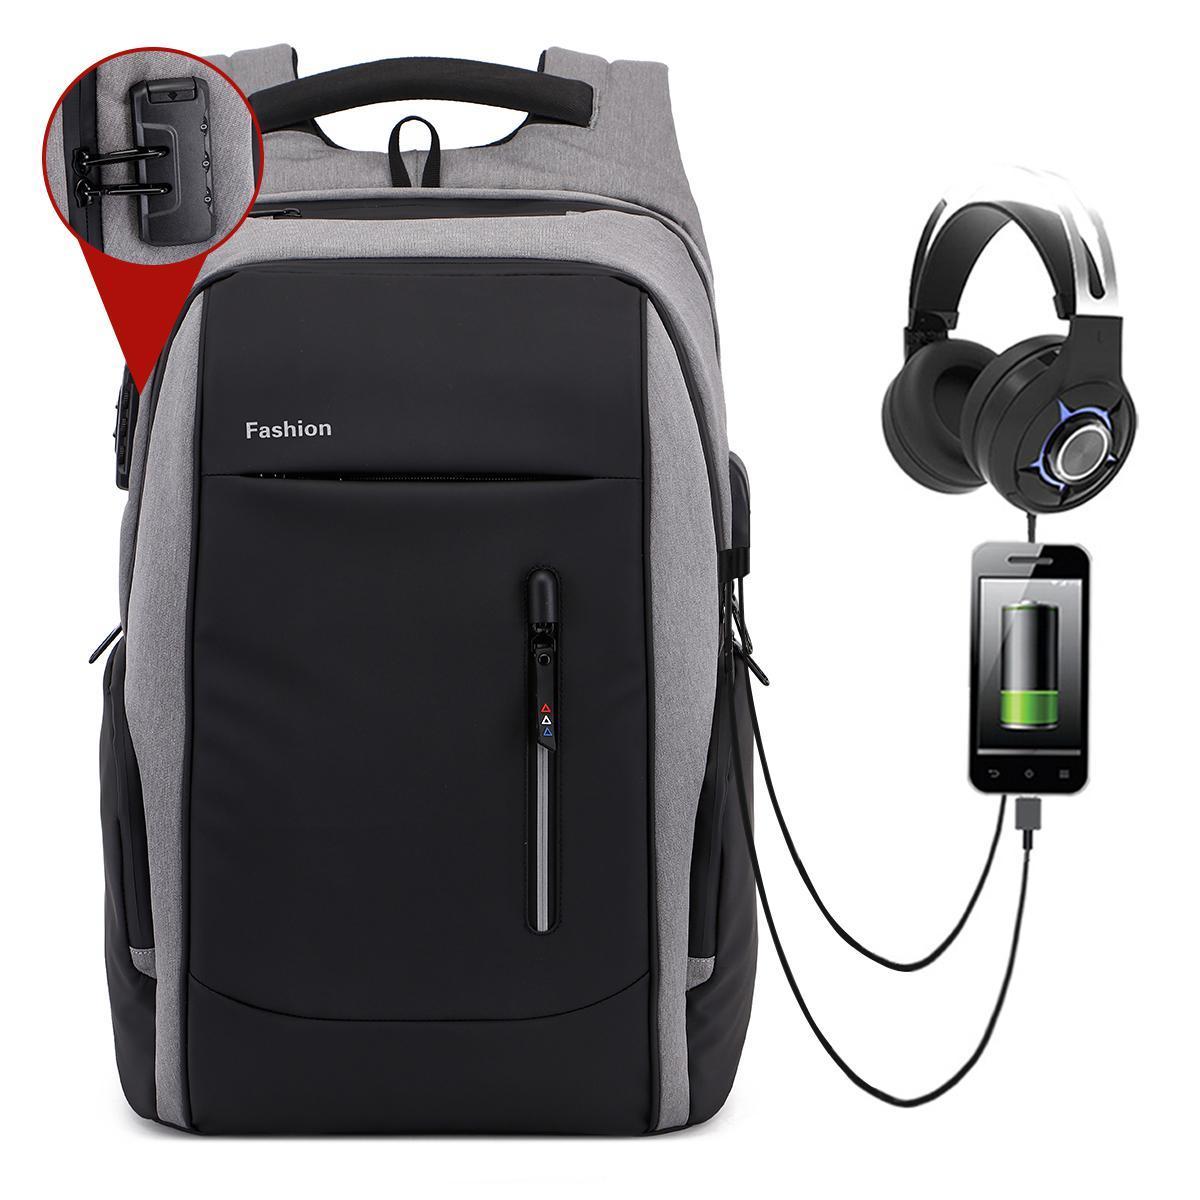 b0b82e8eeb2c Fashion Backpacks for sale - Designer Backpack for Men online brands ...